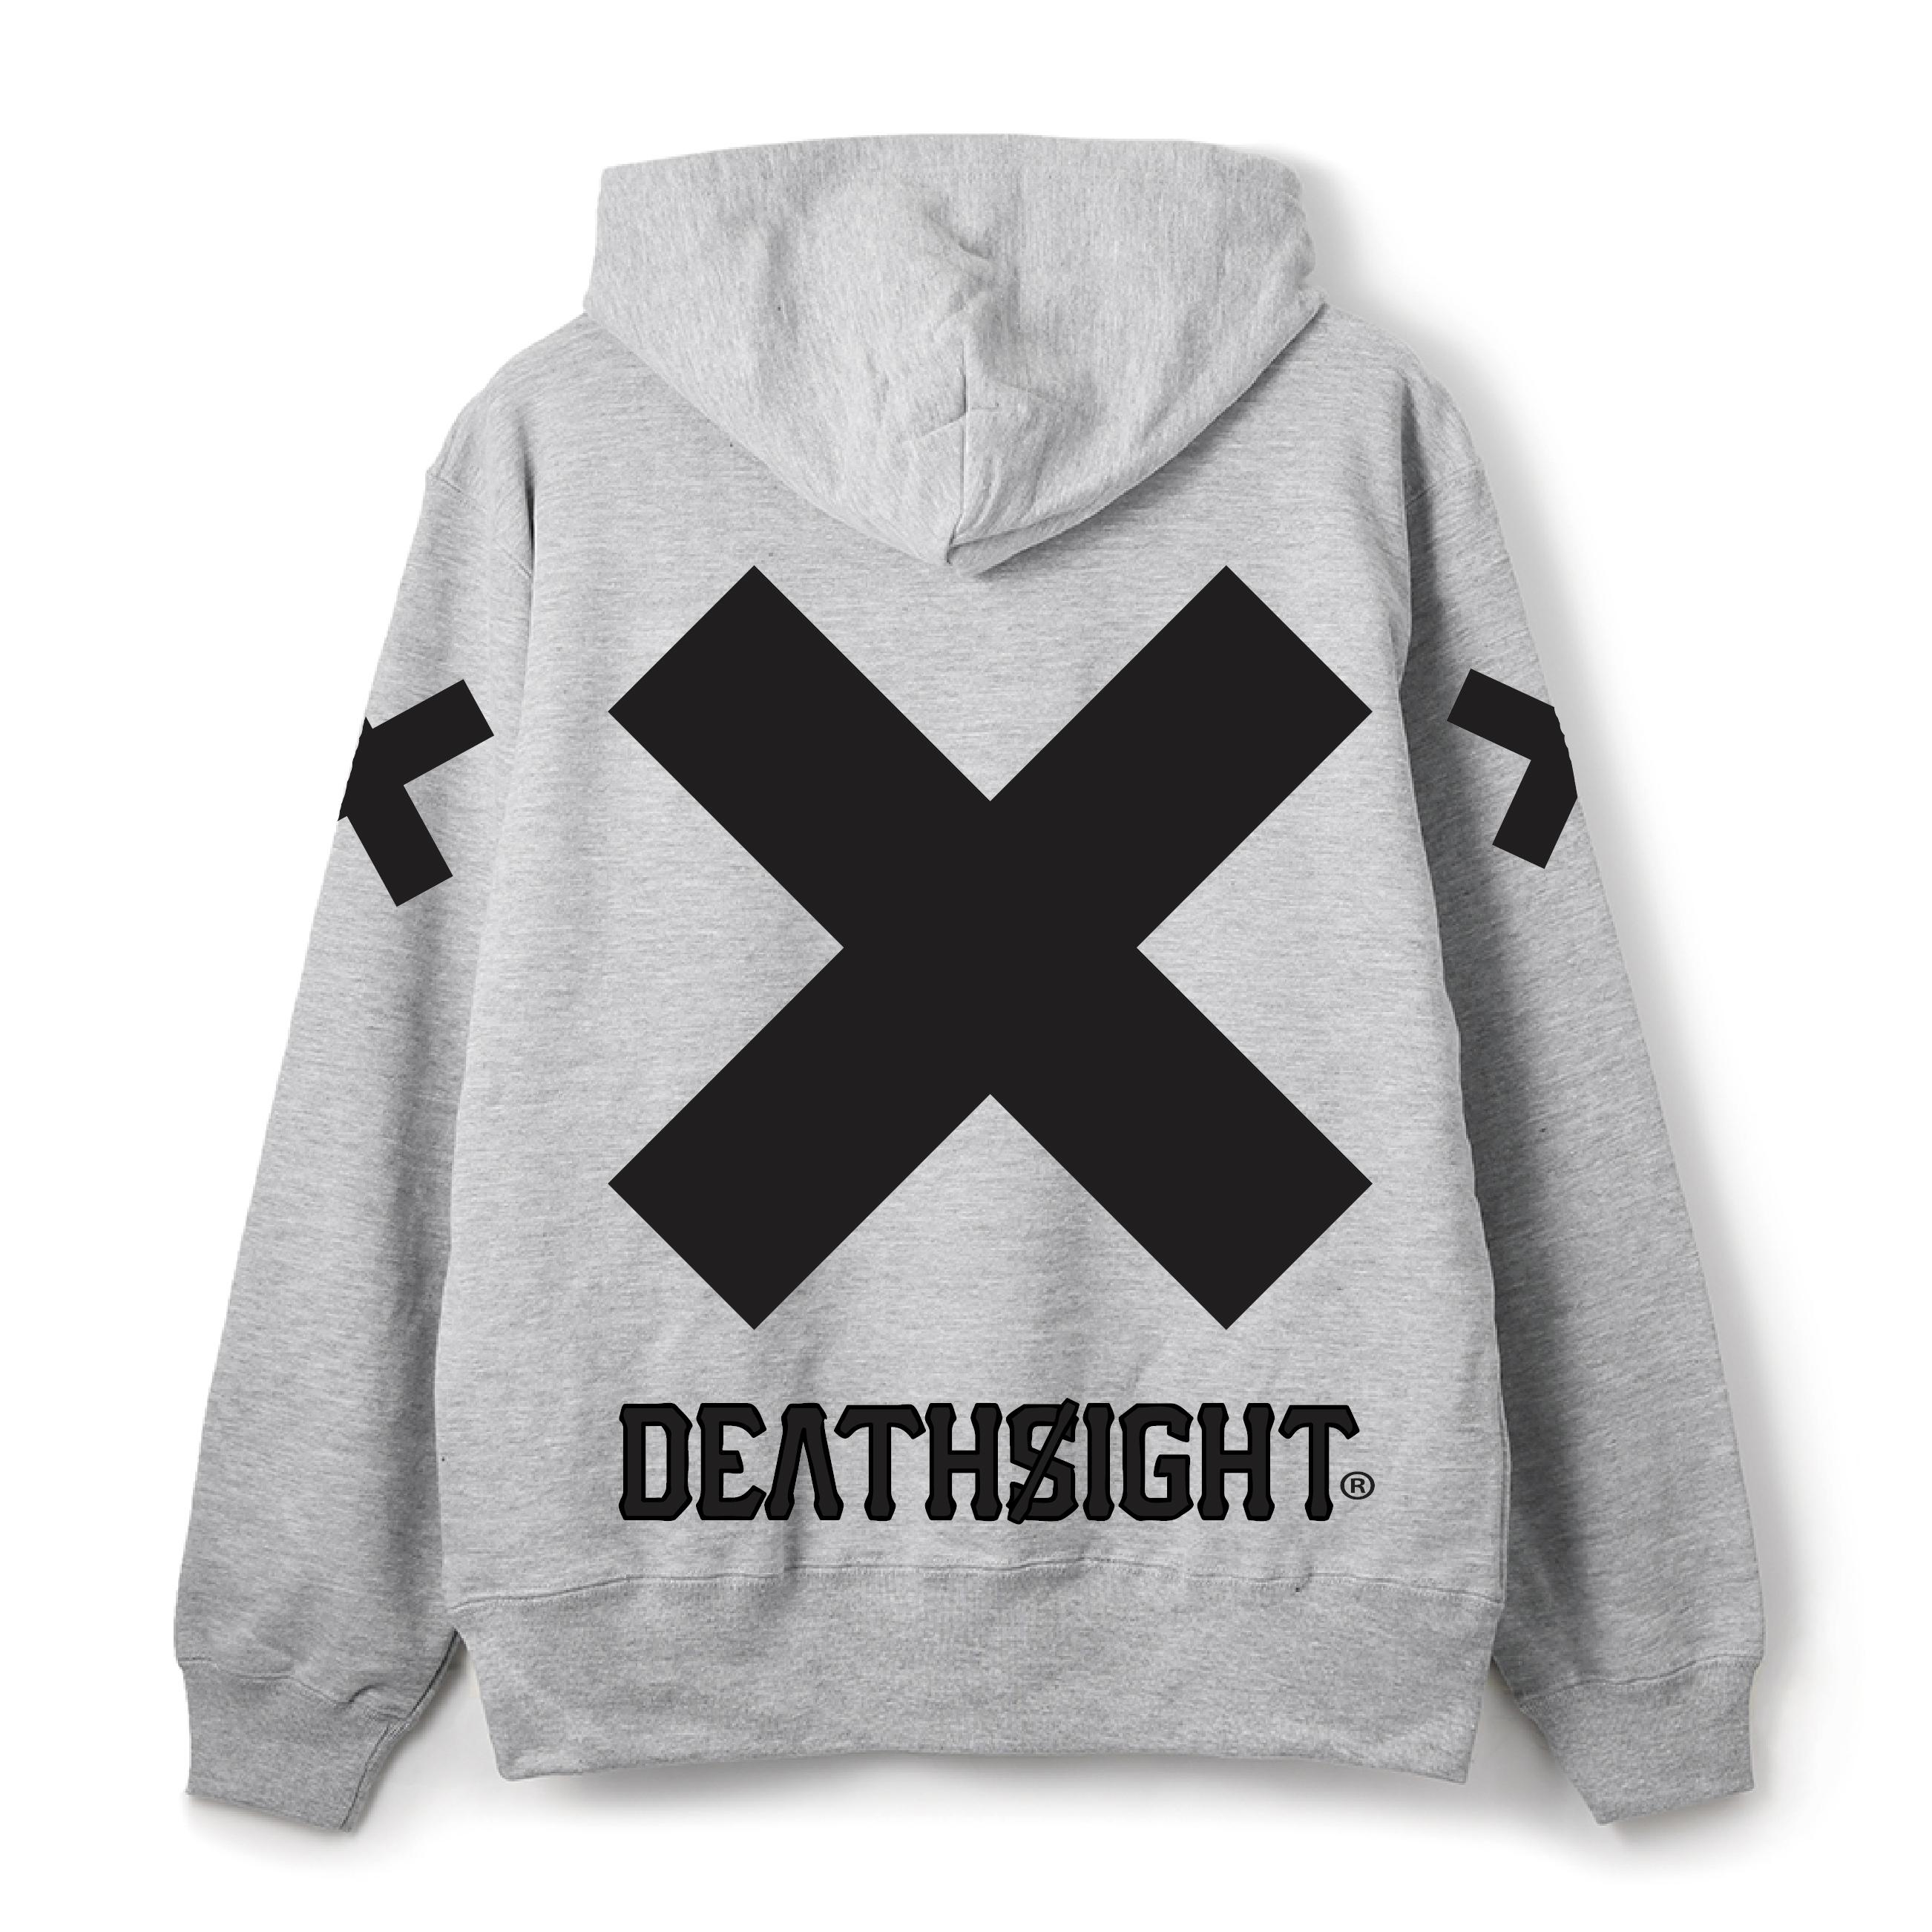 deathsight 17 Hoodie / GRAY - 画像2